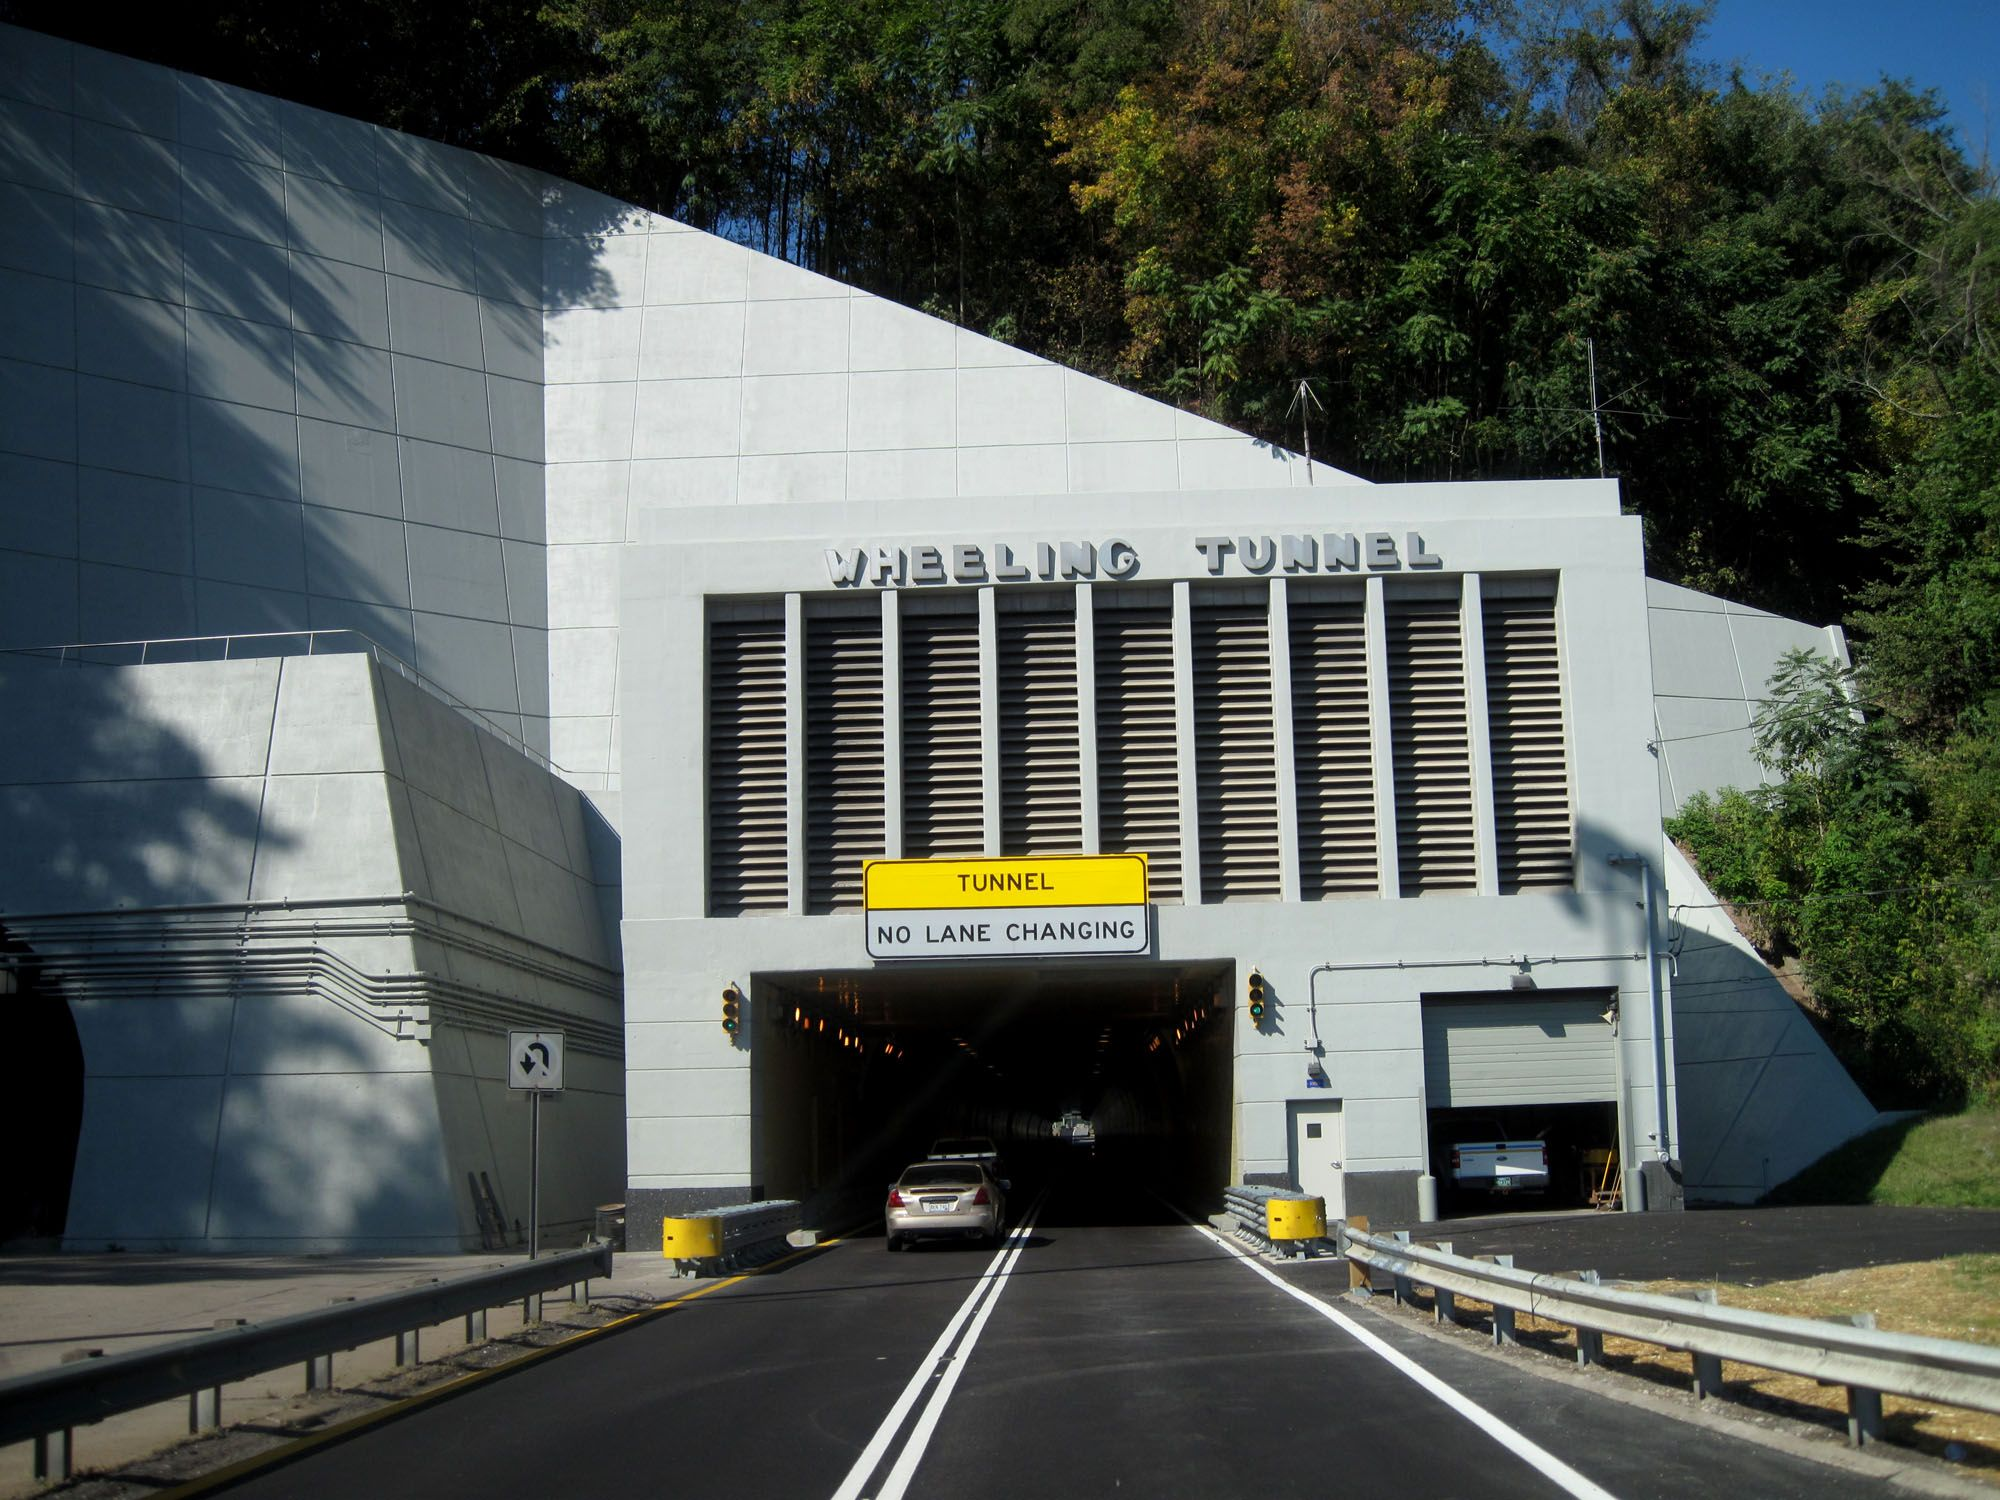 Wheeling Tunnel West Virginia Mountains West Virginia Wheeling Wv